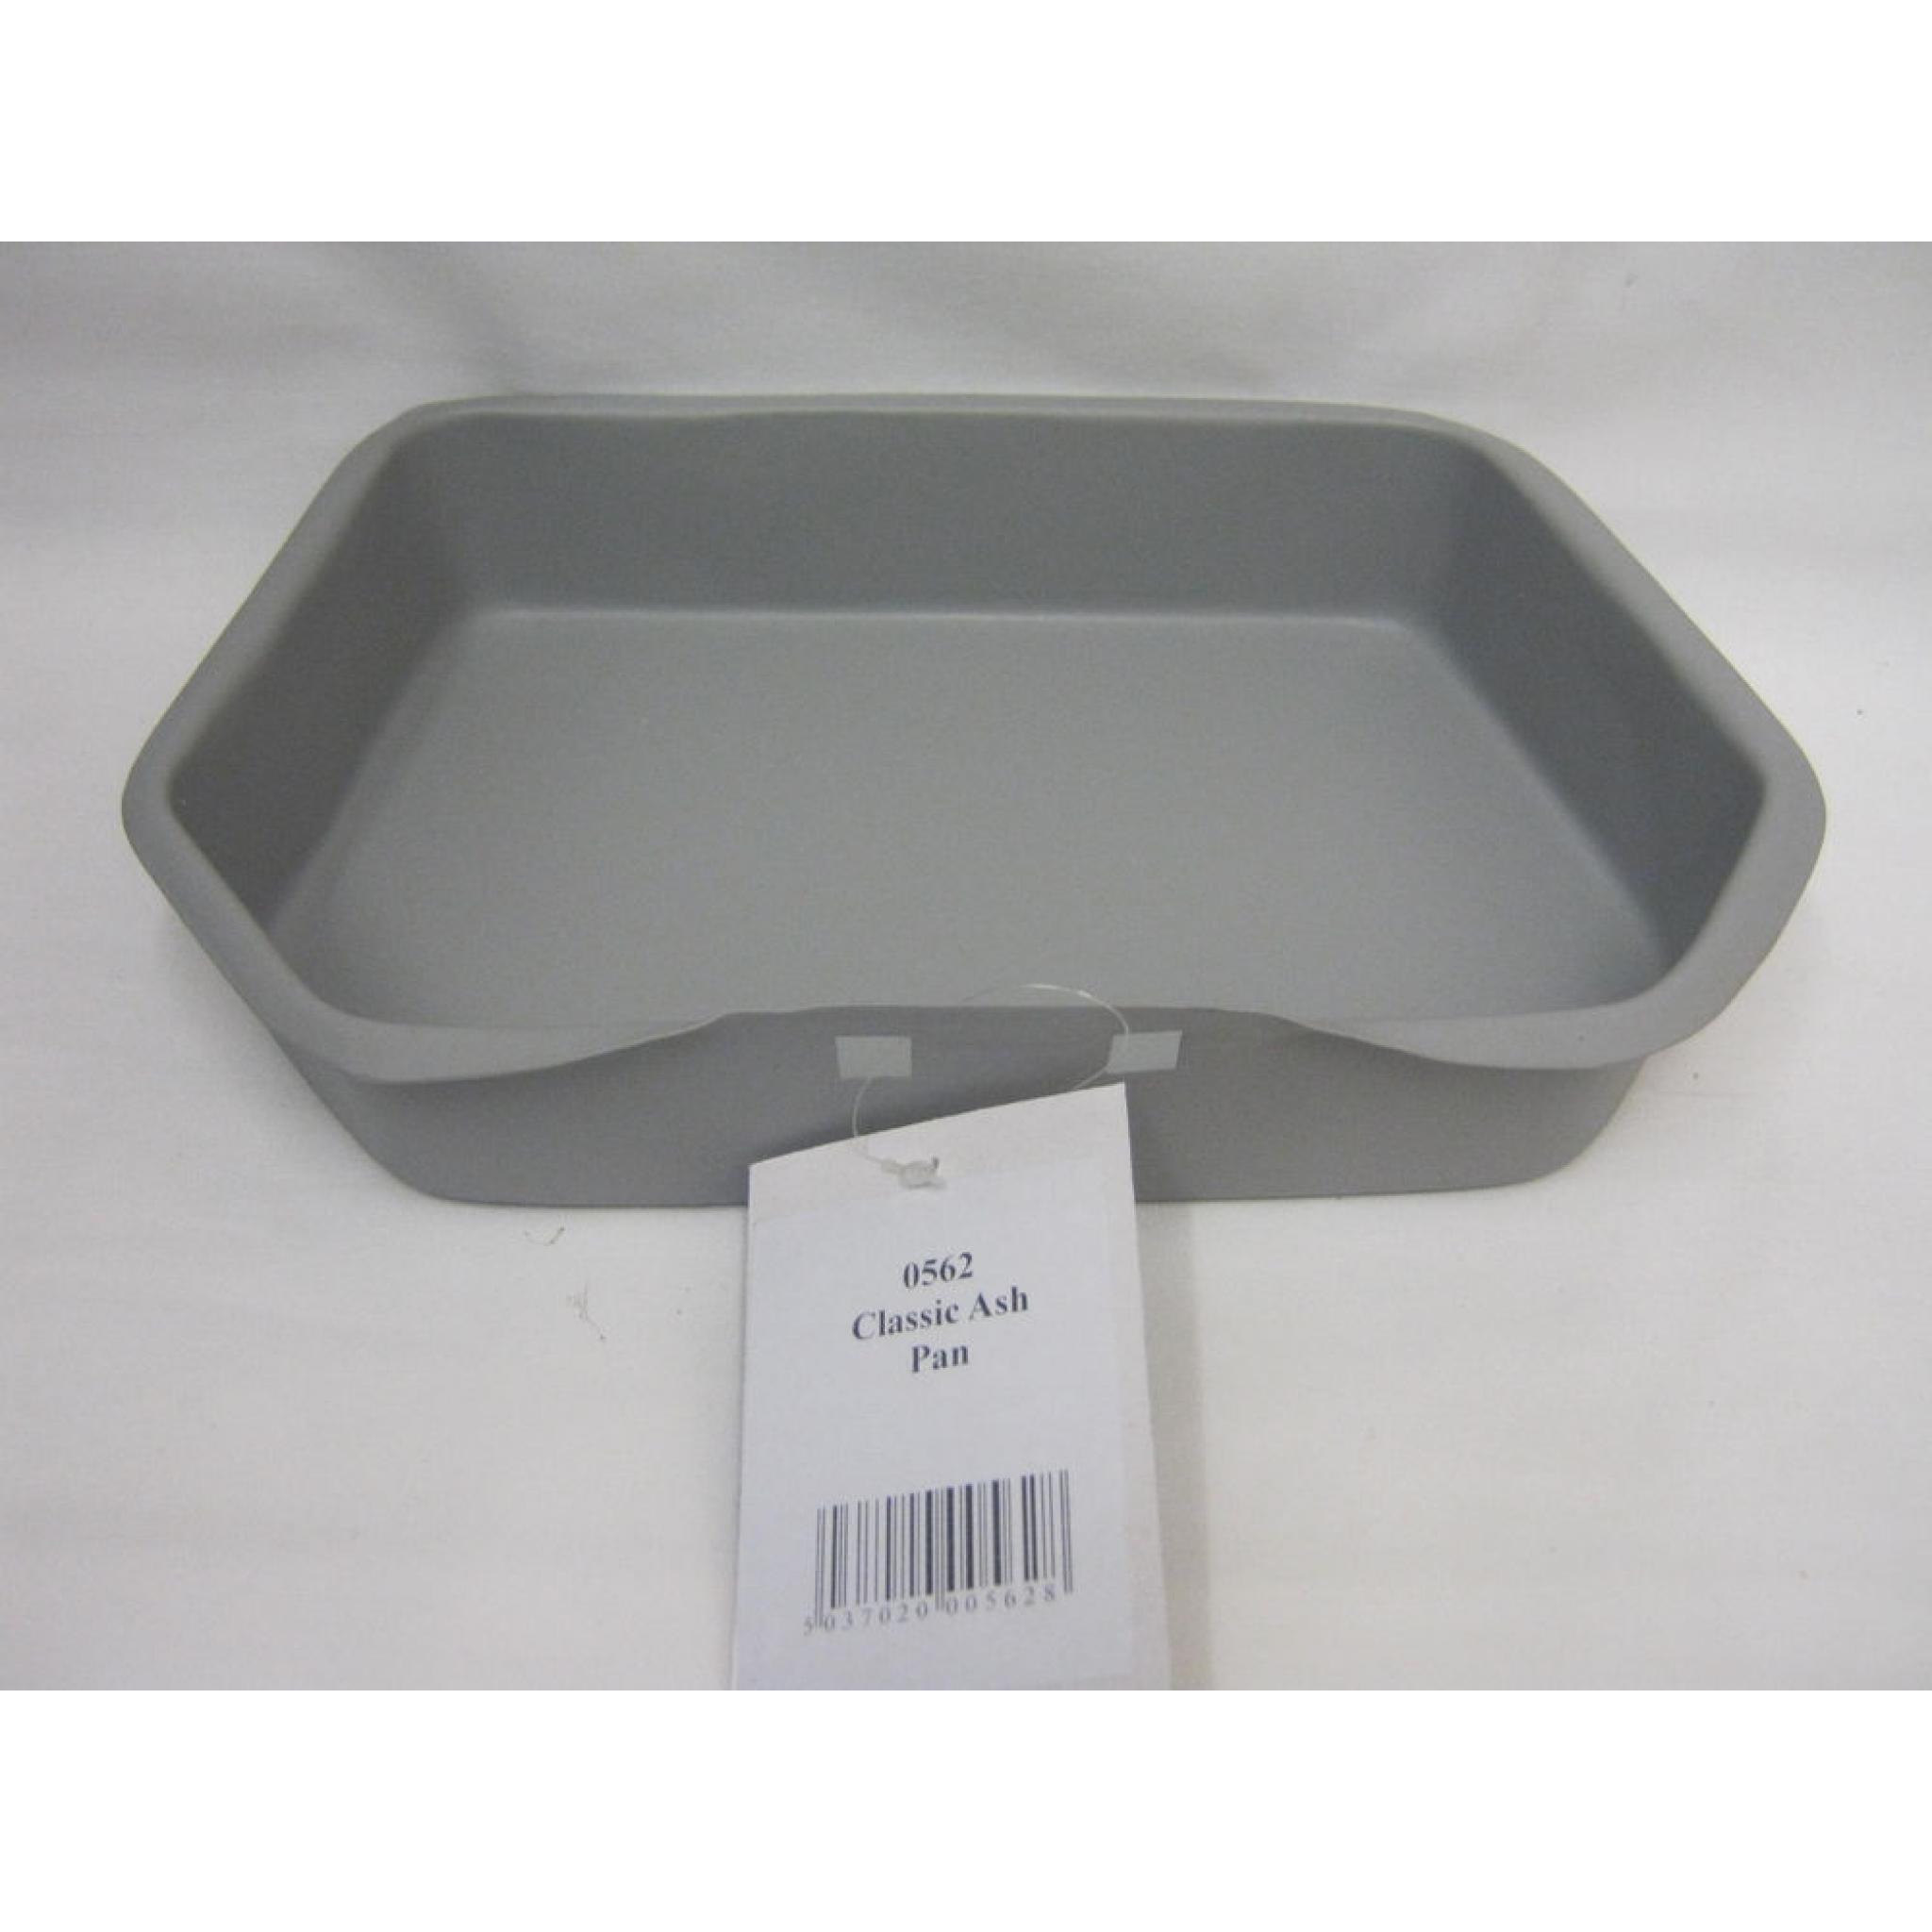 new manor deep classic ashpan grey metal ash pan coal grate fire 0562